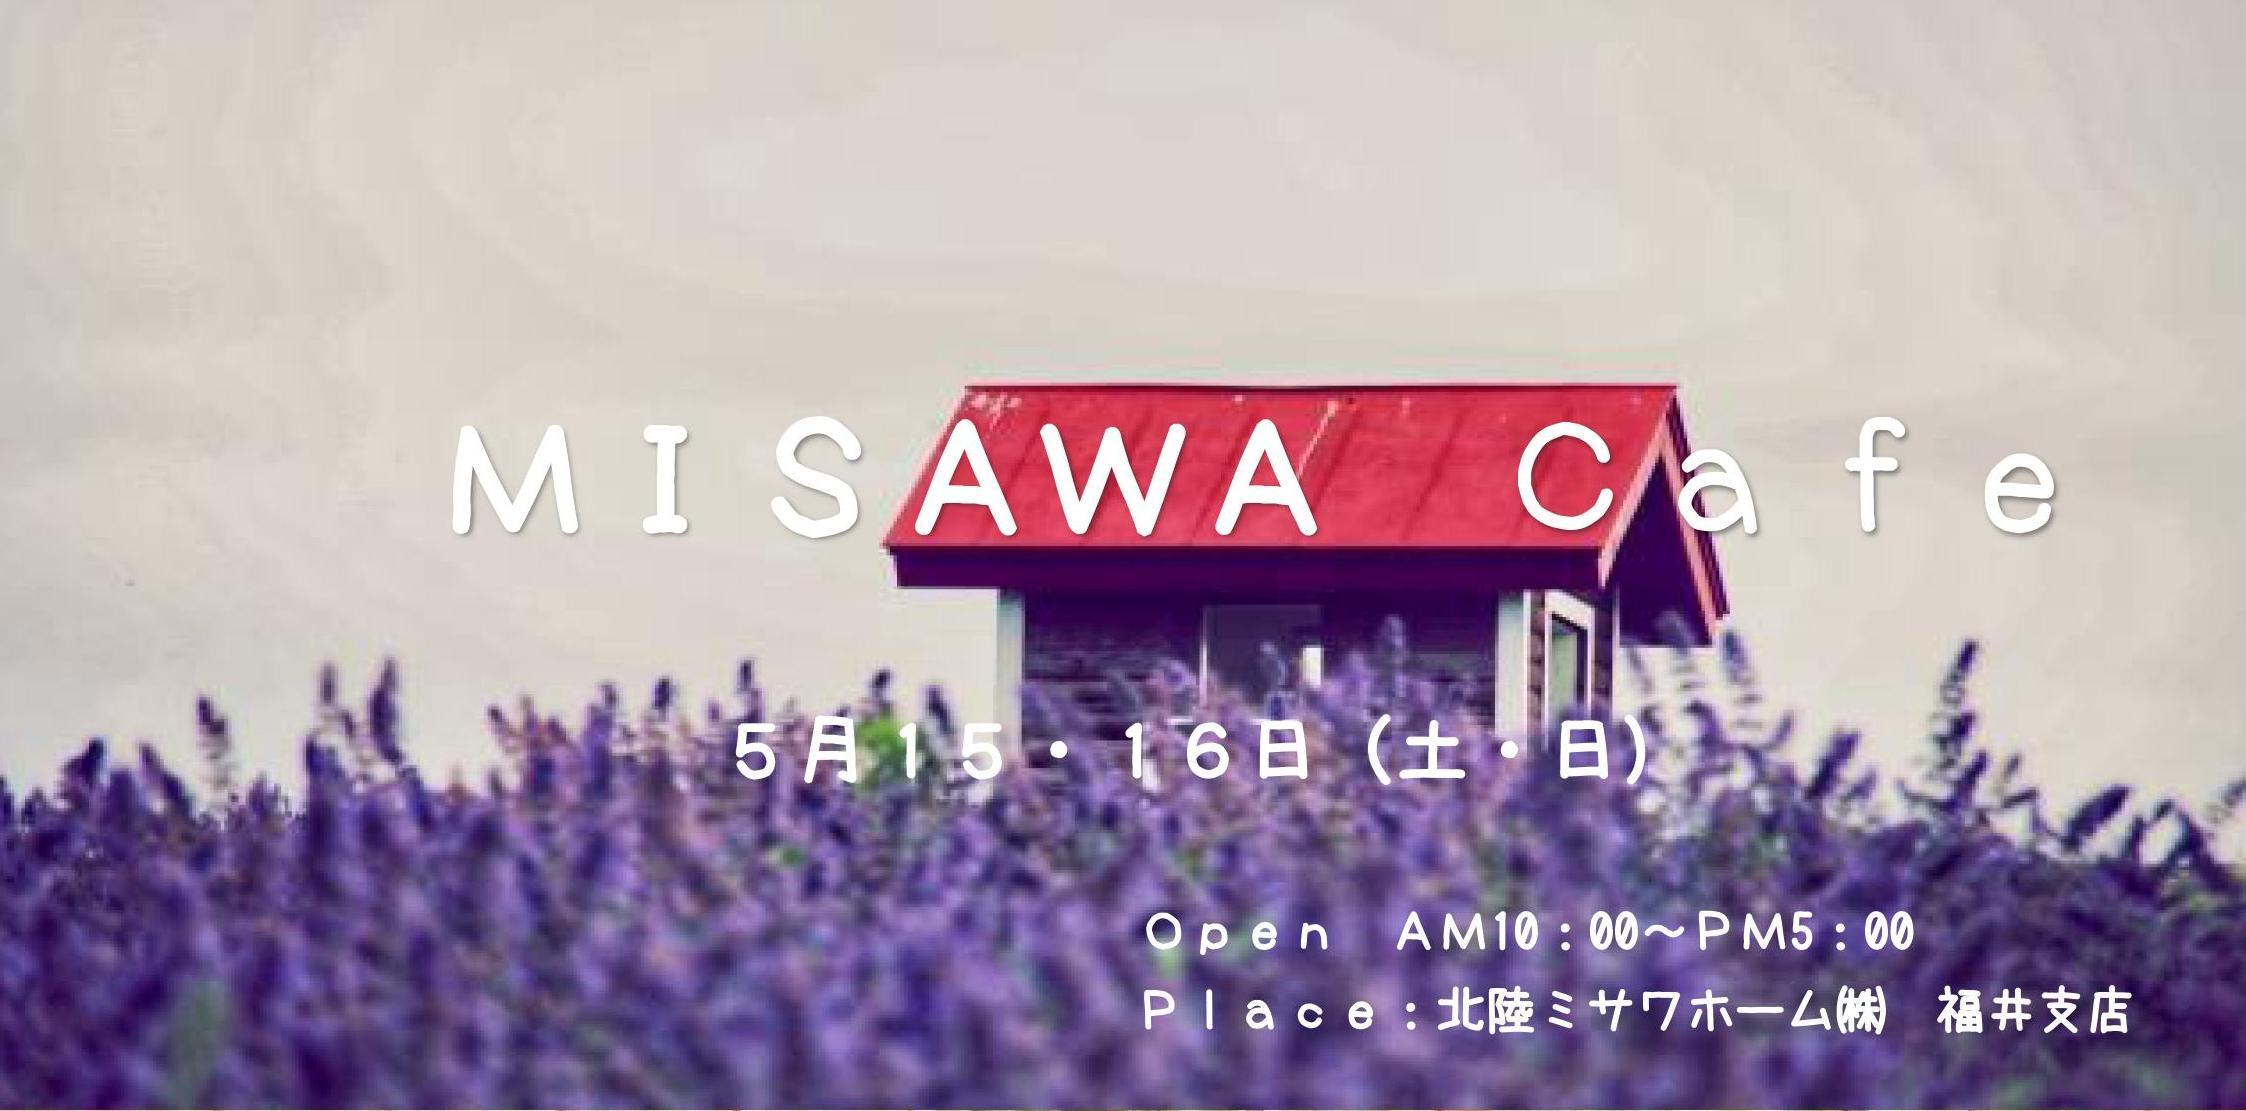 MISAWA Cafe in FUKUI